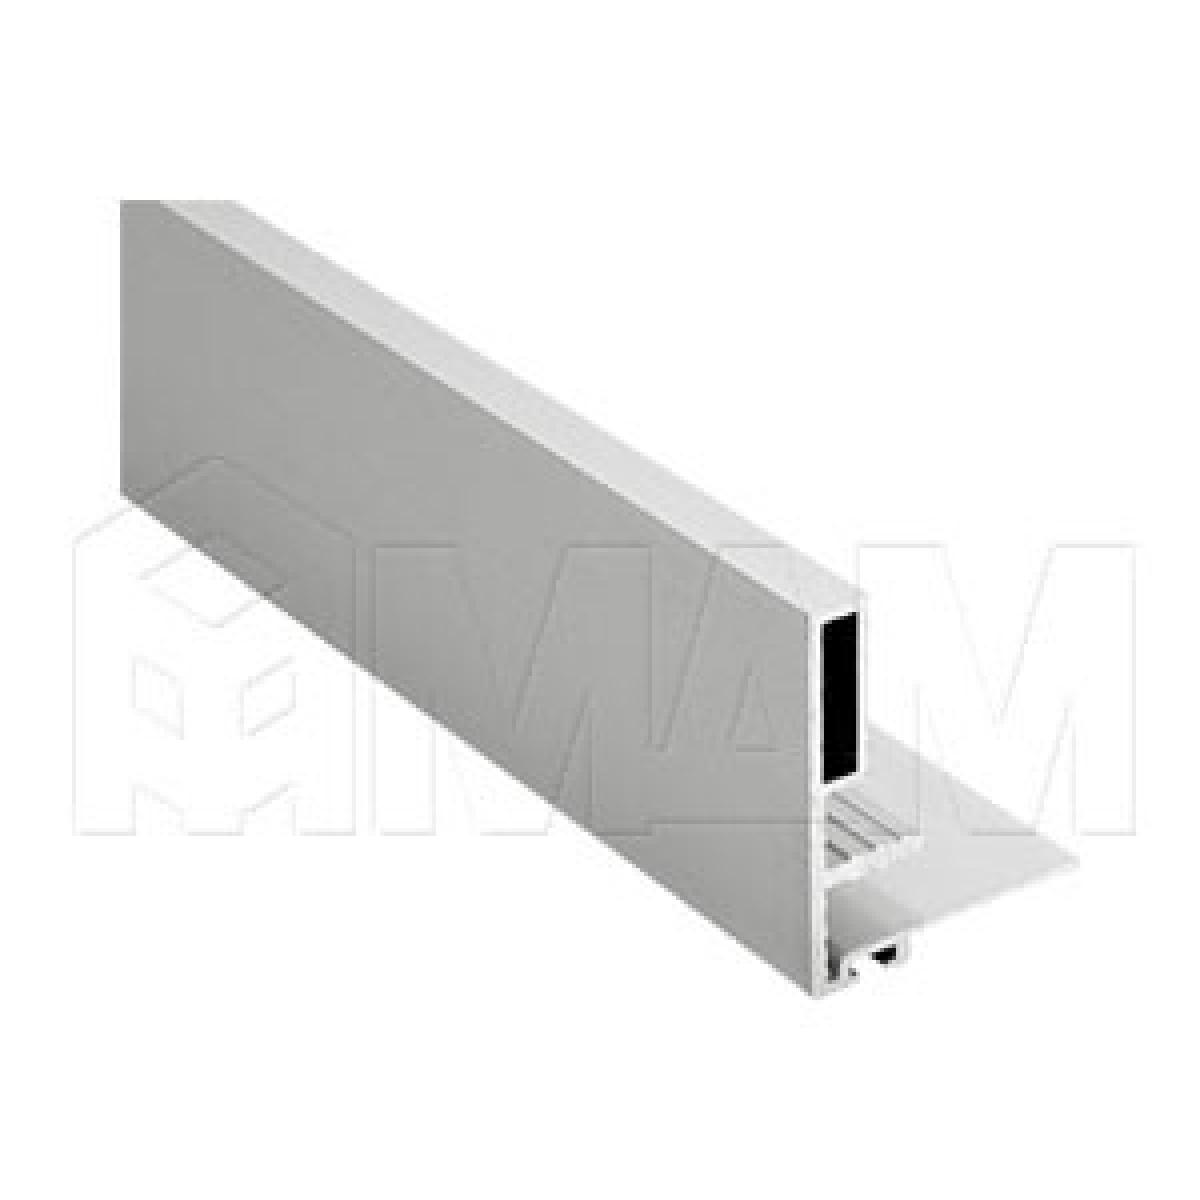 PS10 Профиль-ручка станд., для фасада 18 мм, серебро, L-5300